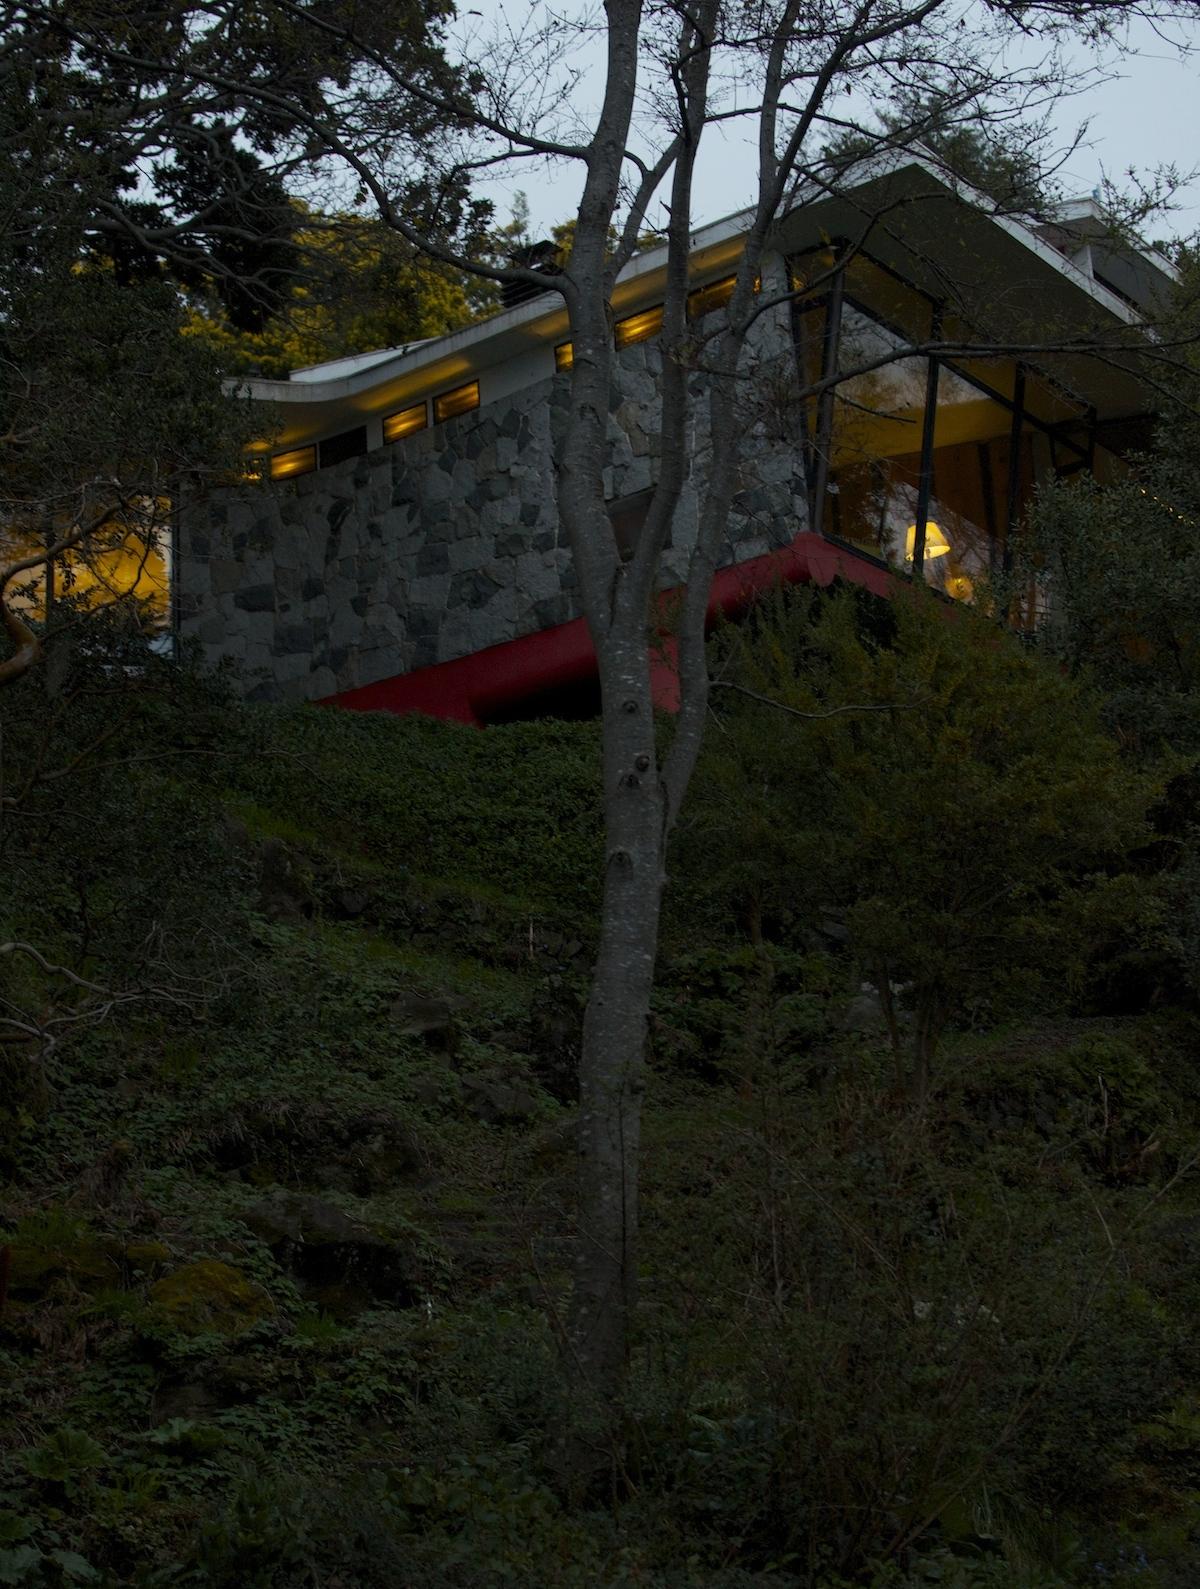 hotel-antumalal-beta-pinheiro-pucon-chile